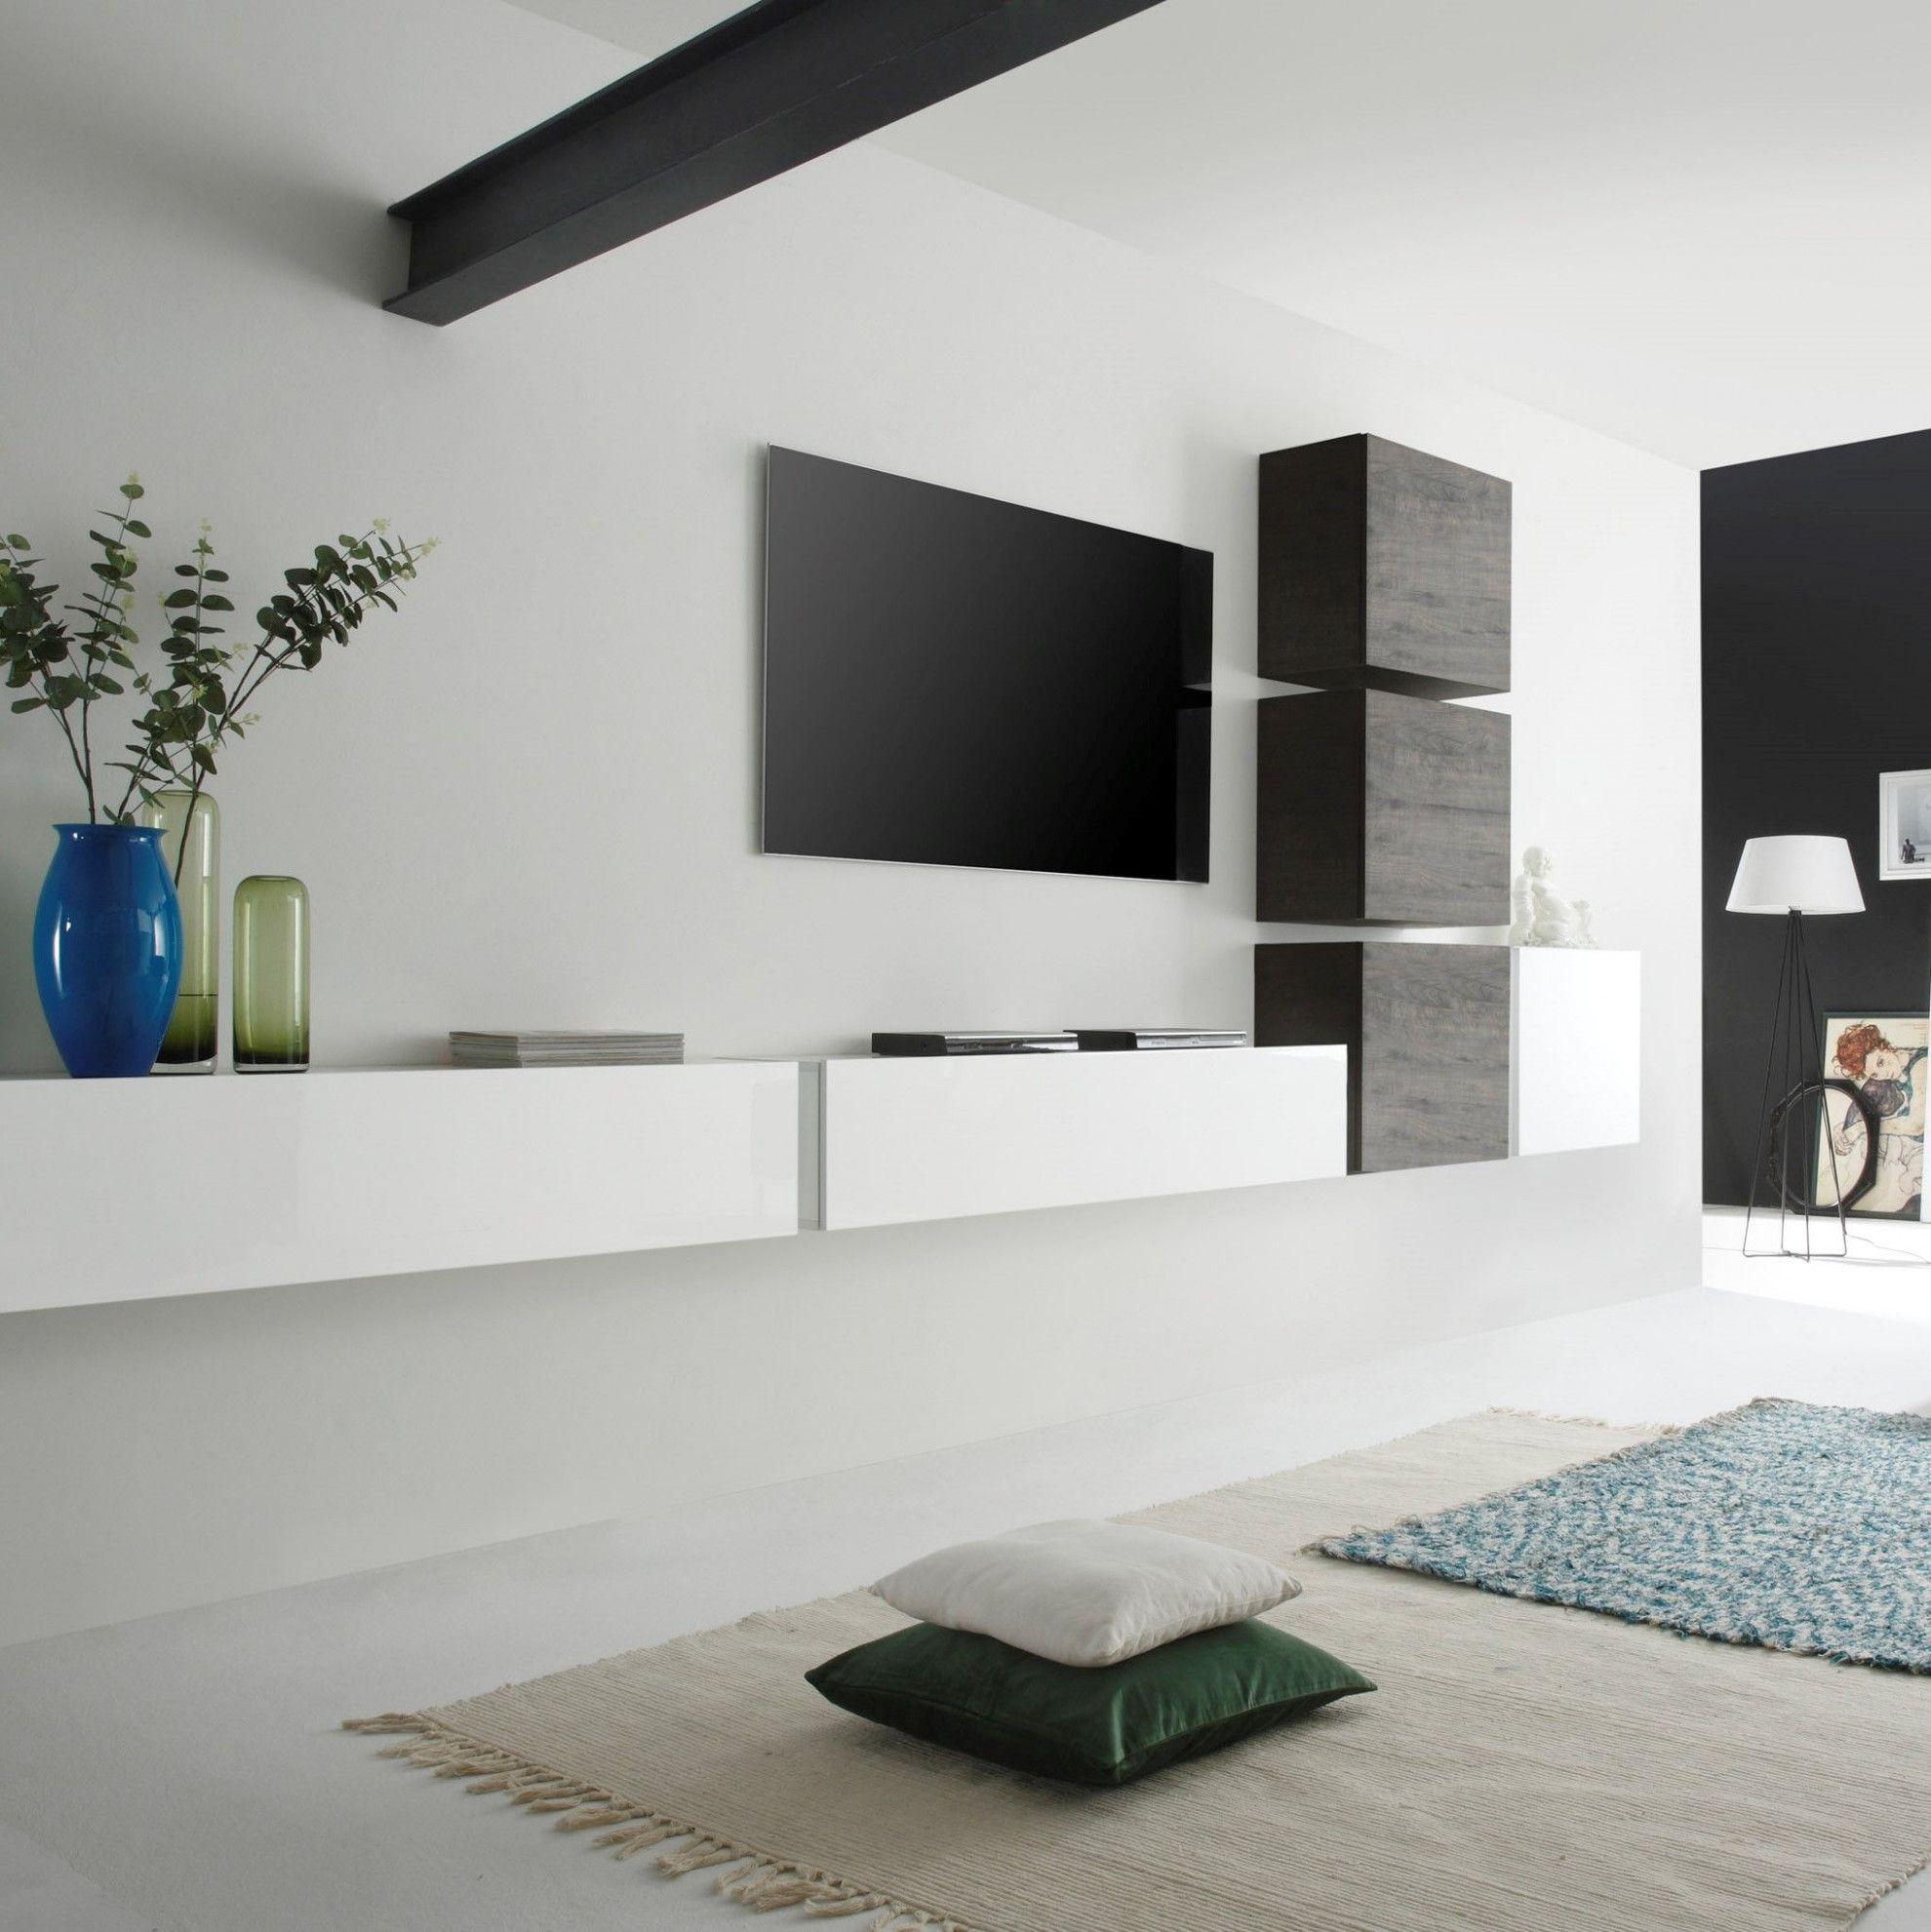 9 Wohnzimmer Schrankwand Design  Living room tv wall, Wall unit